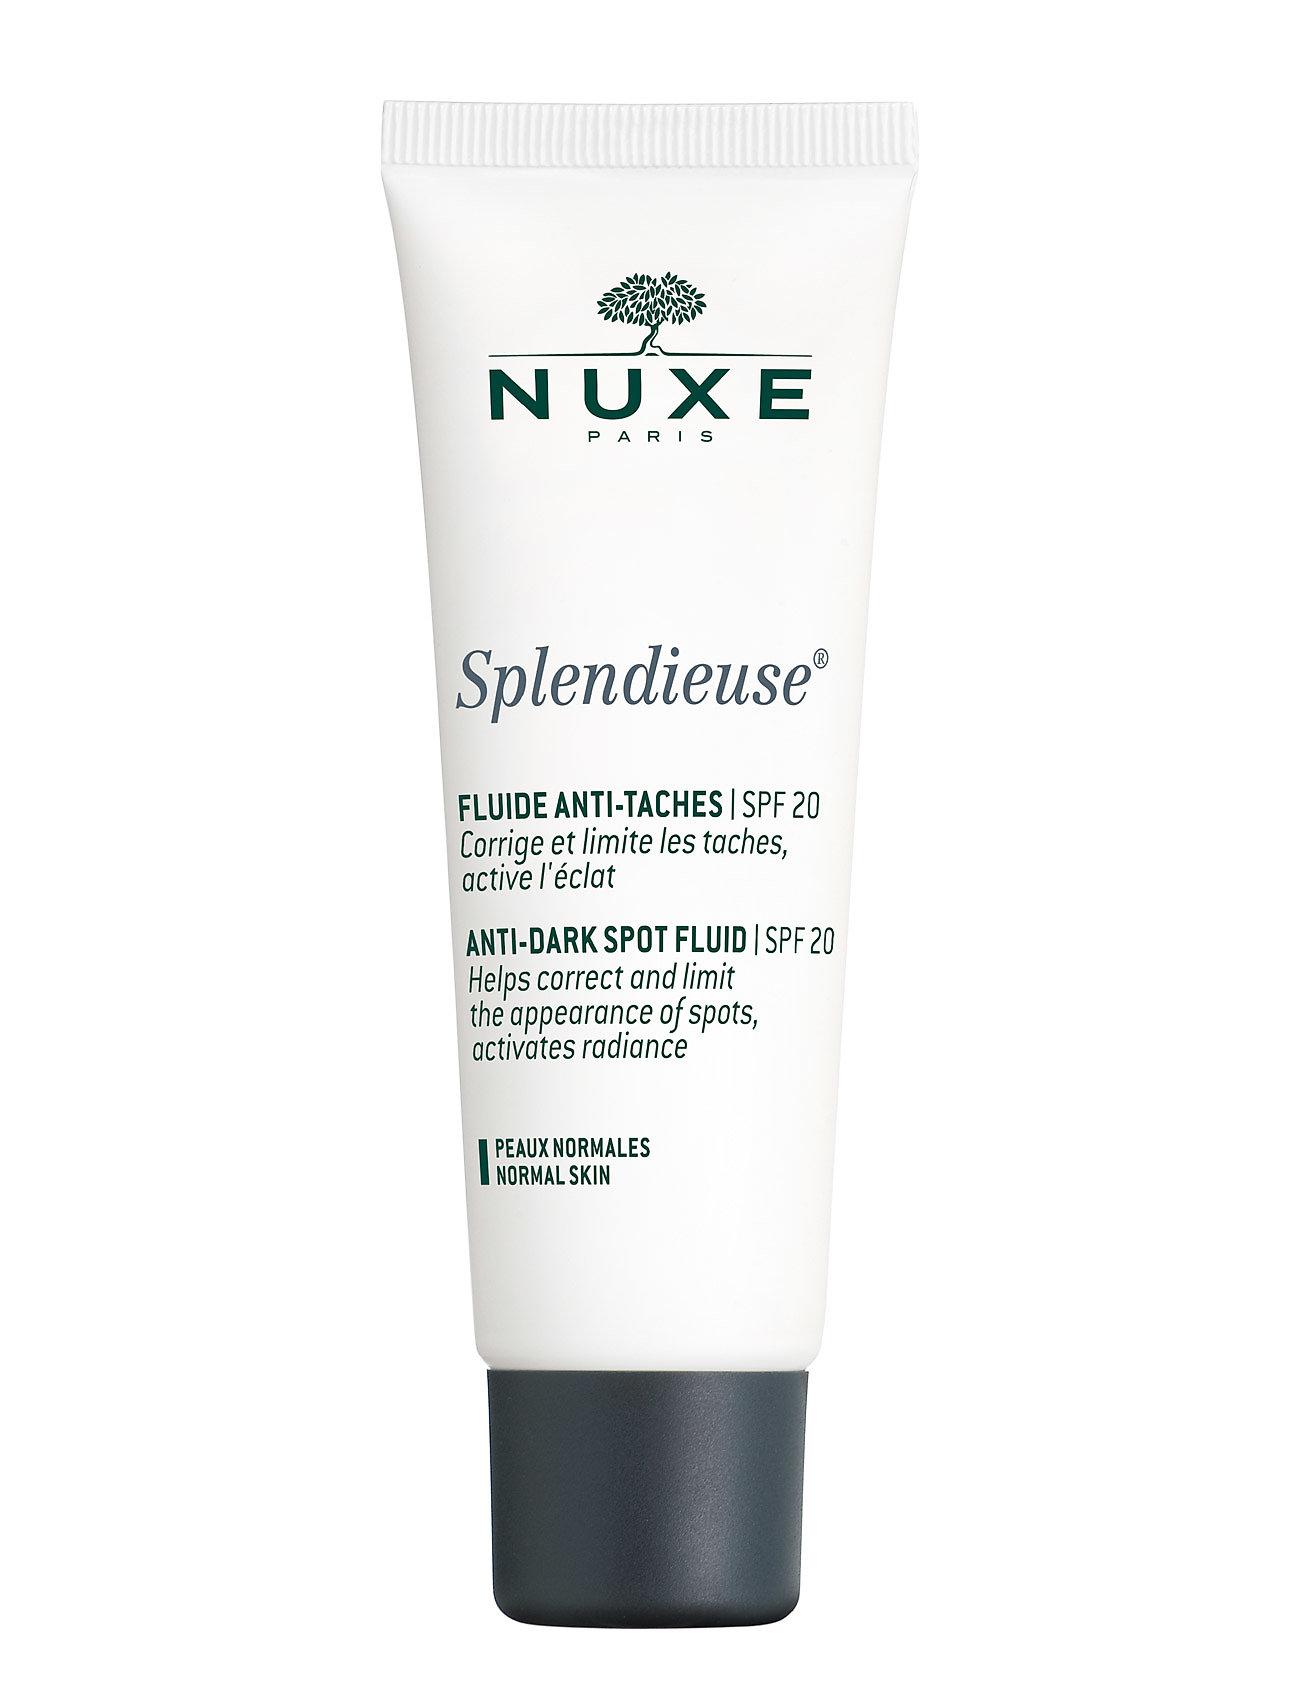 nuxe Splendieuse fluid spf 20 fra boozt.com dk